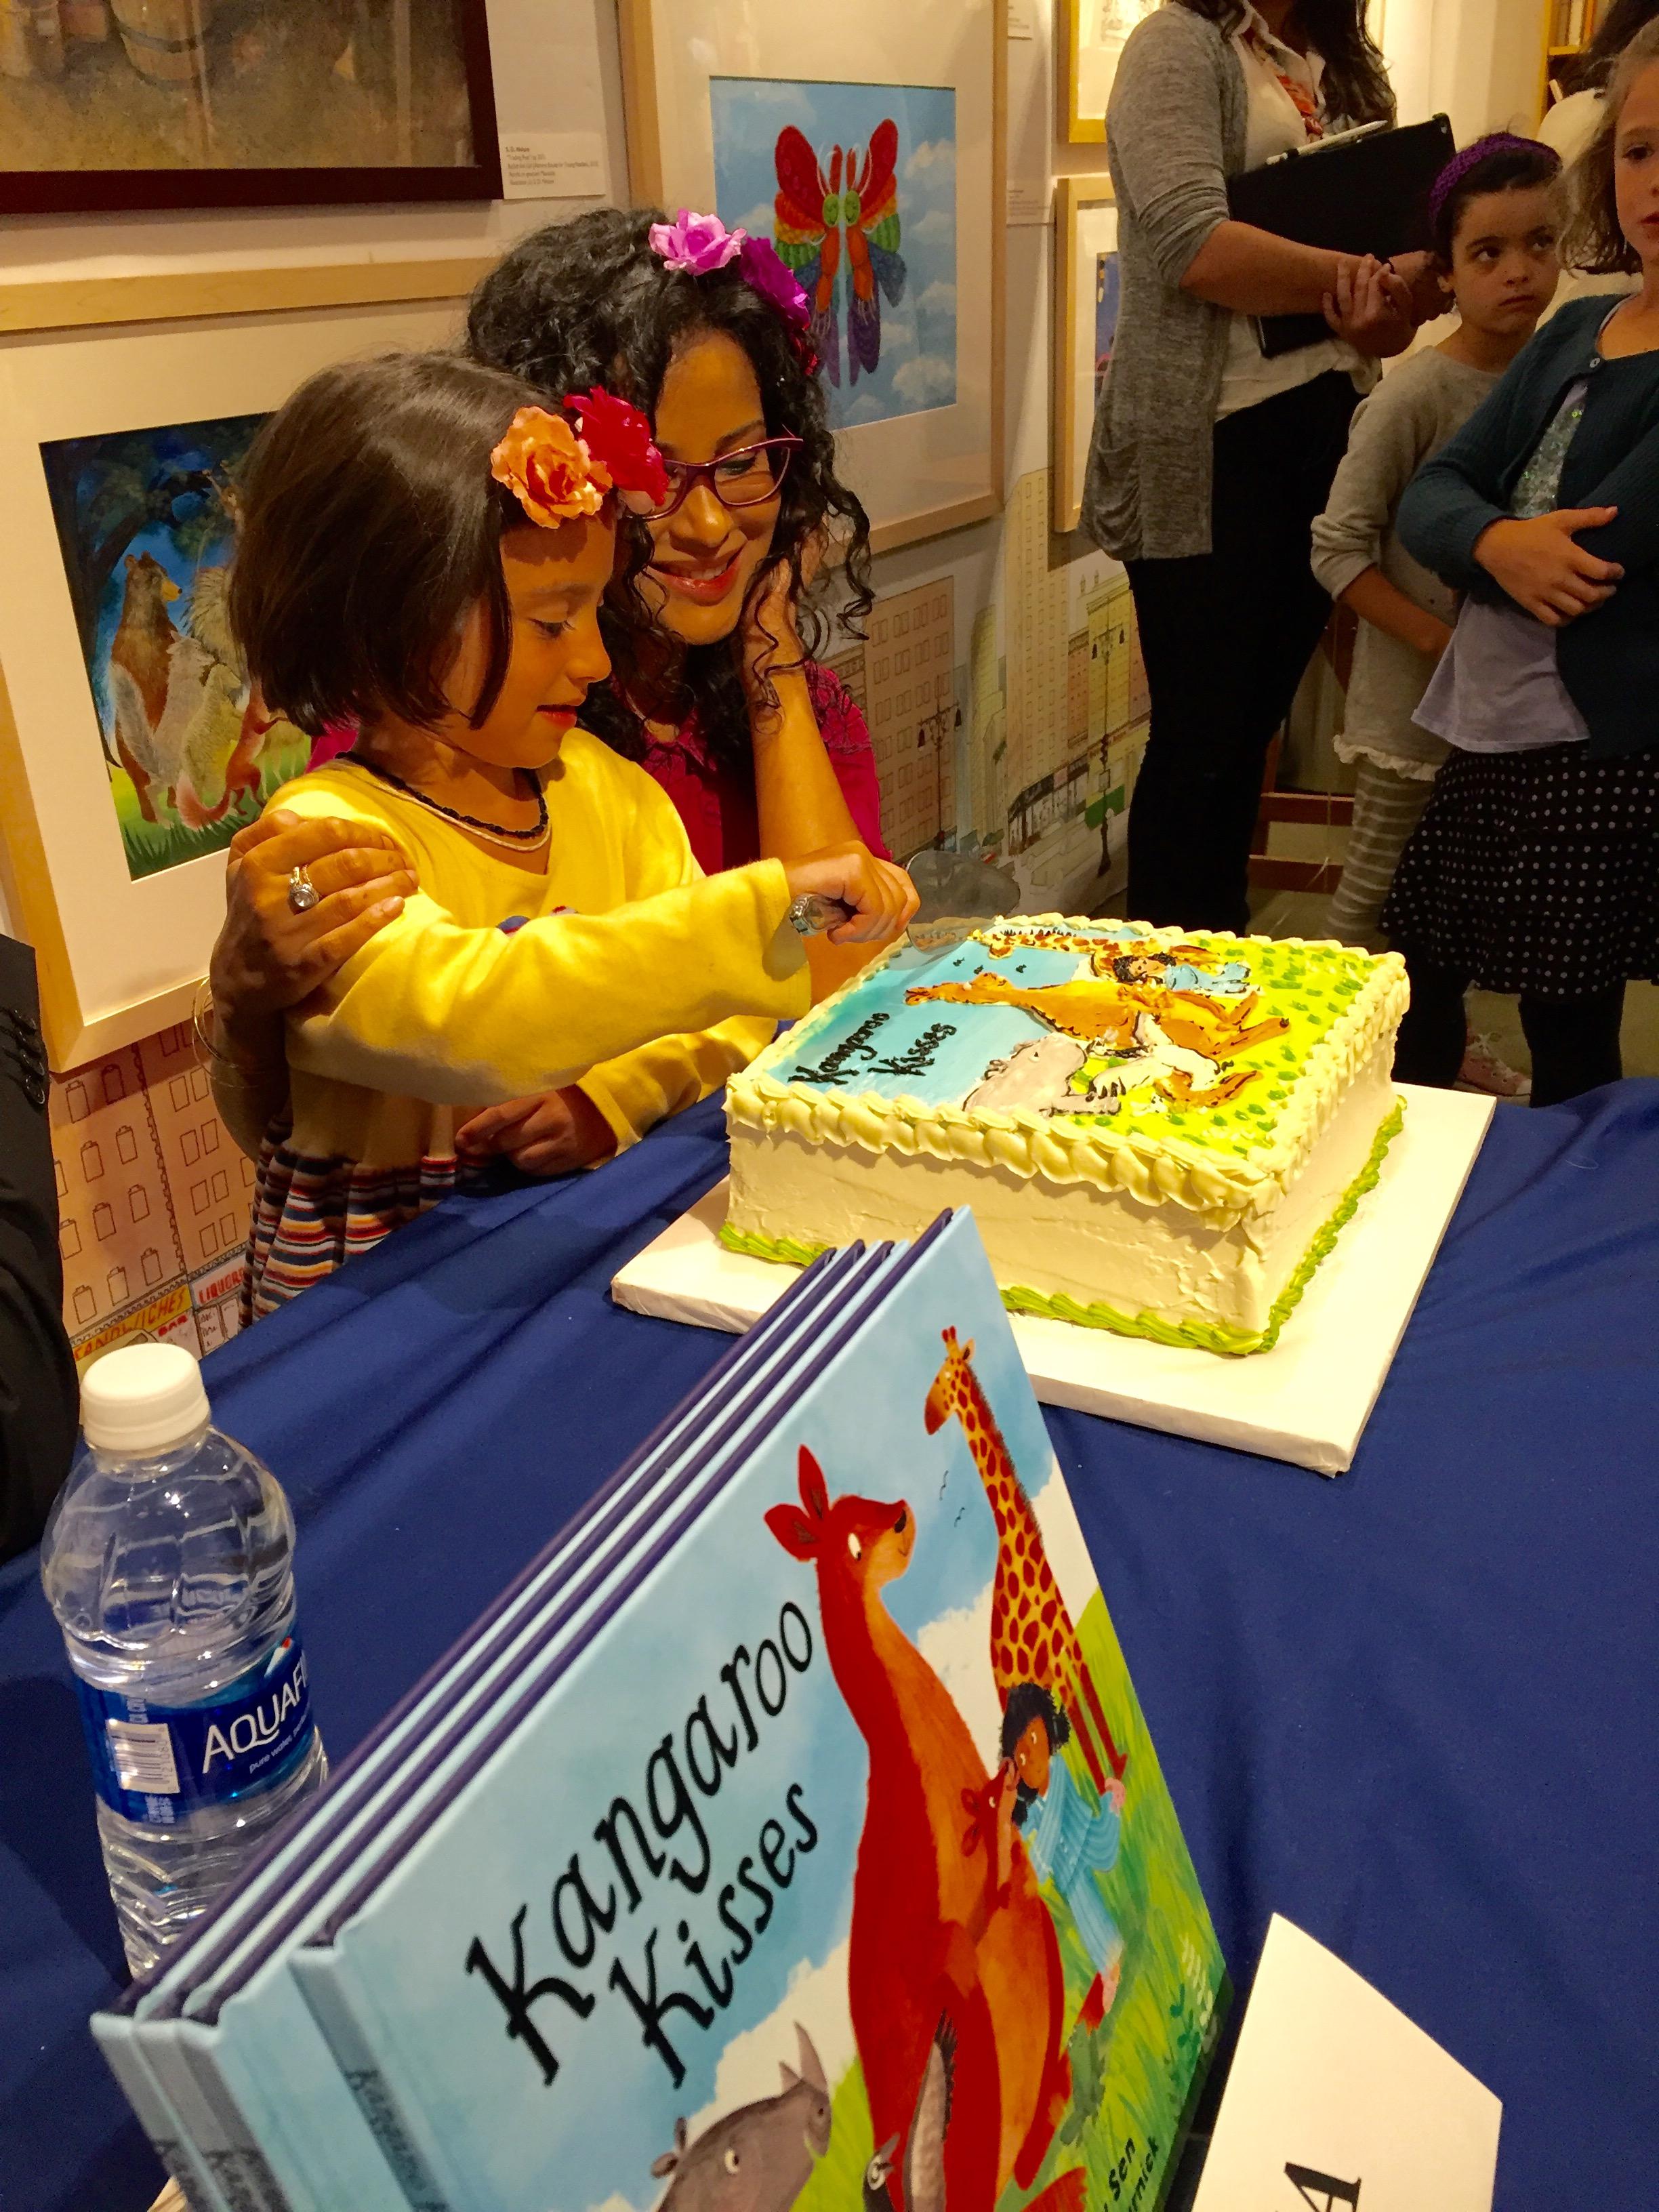 Sulakshana takes charge of the cake, Books of Wonder, September 25, 2016